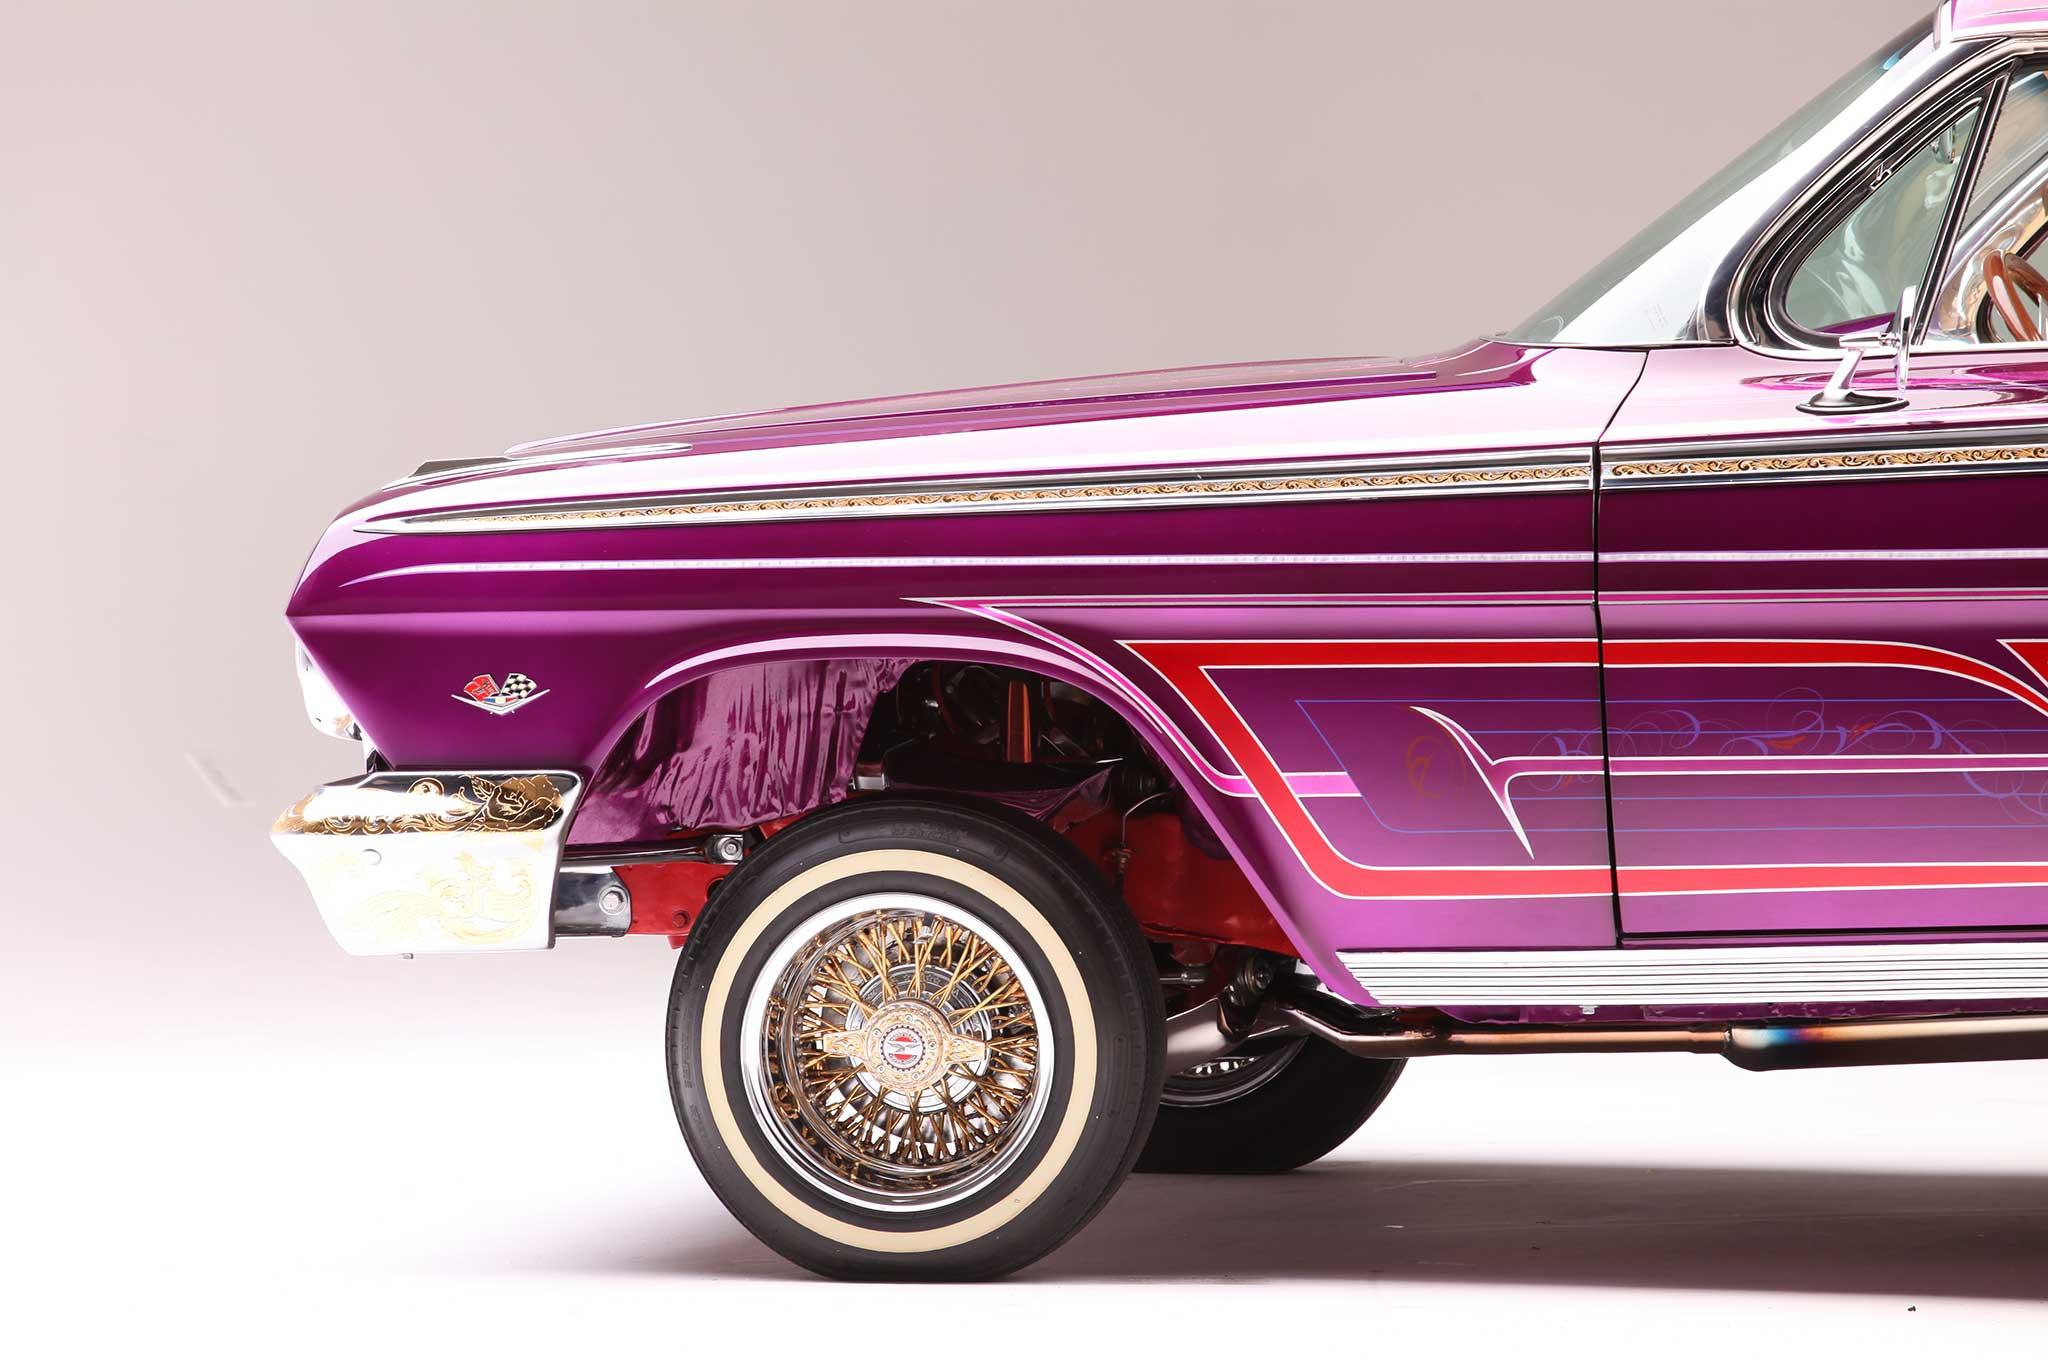 1962 Chevrolet Impala SS - Right Hand Man - Lowrider